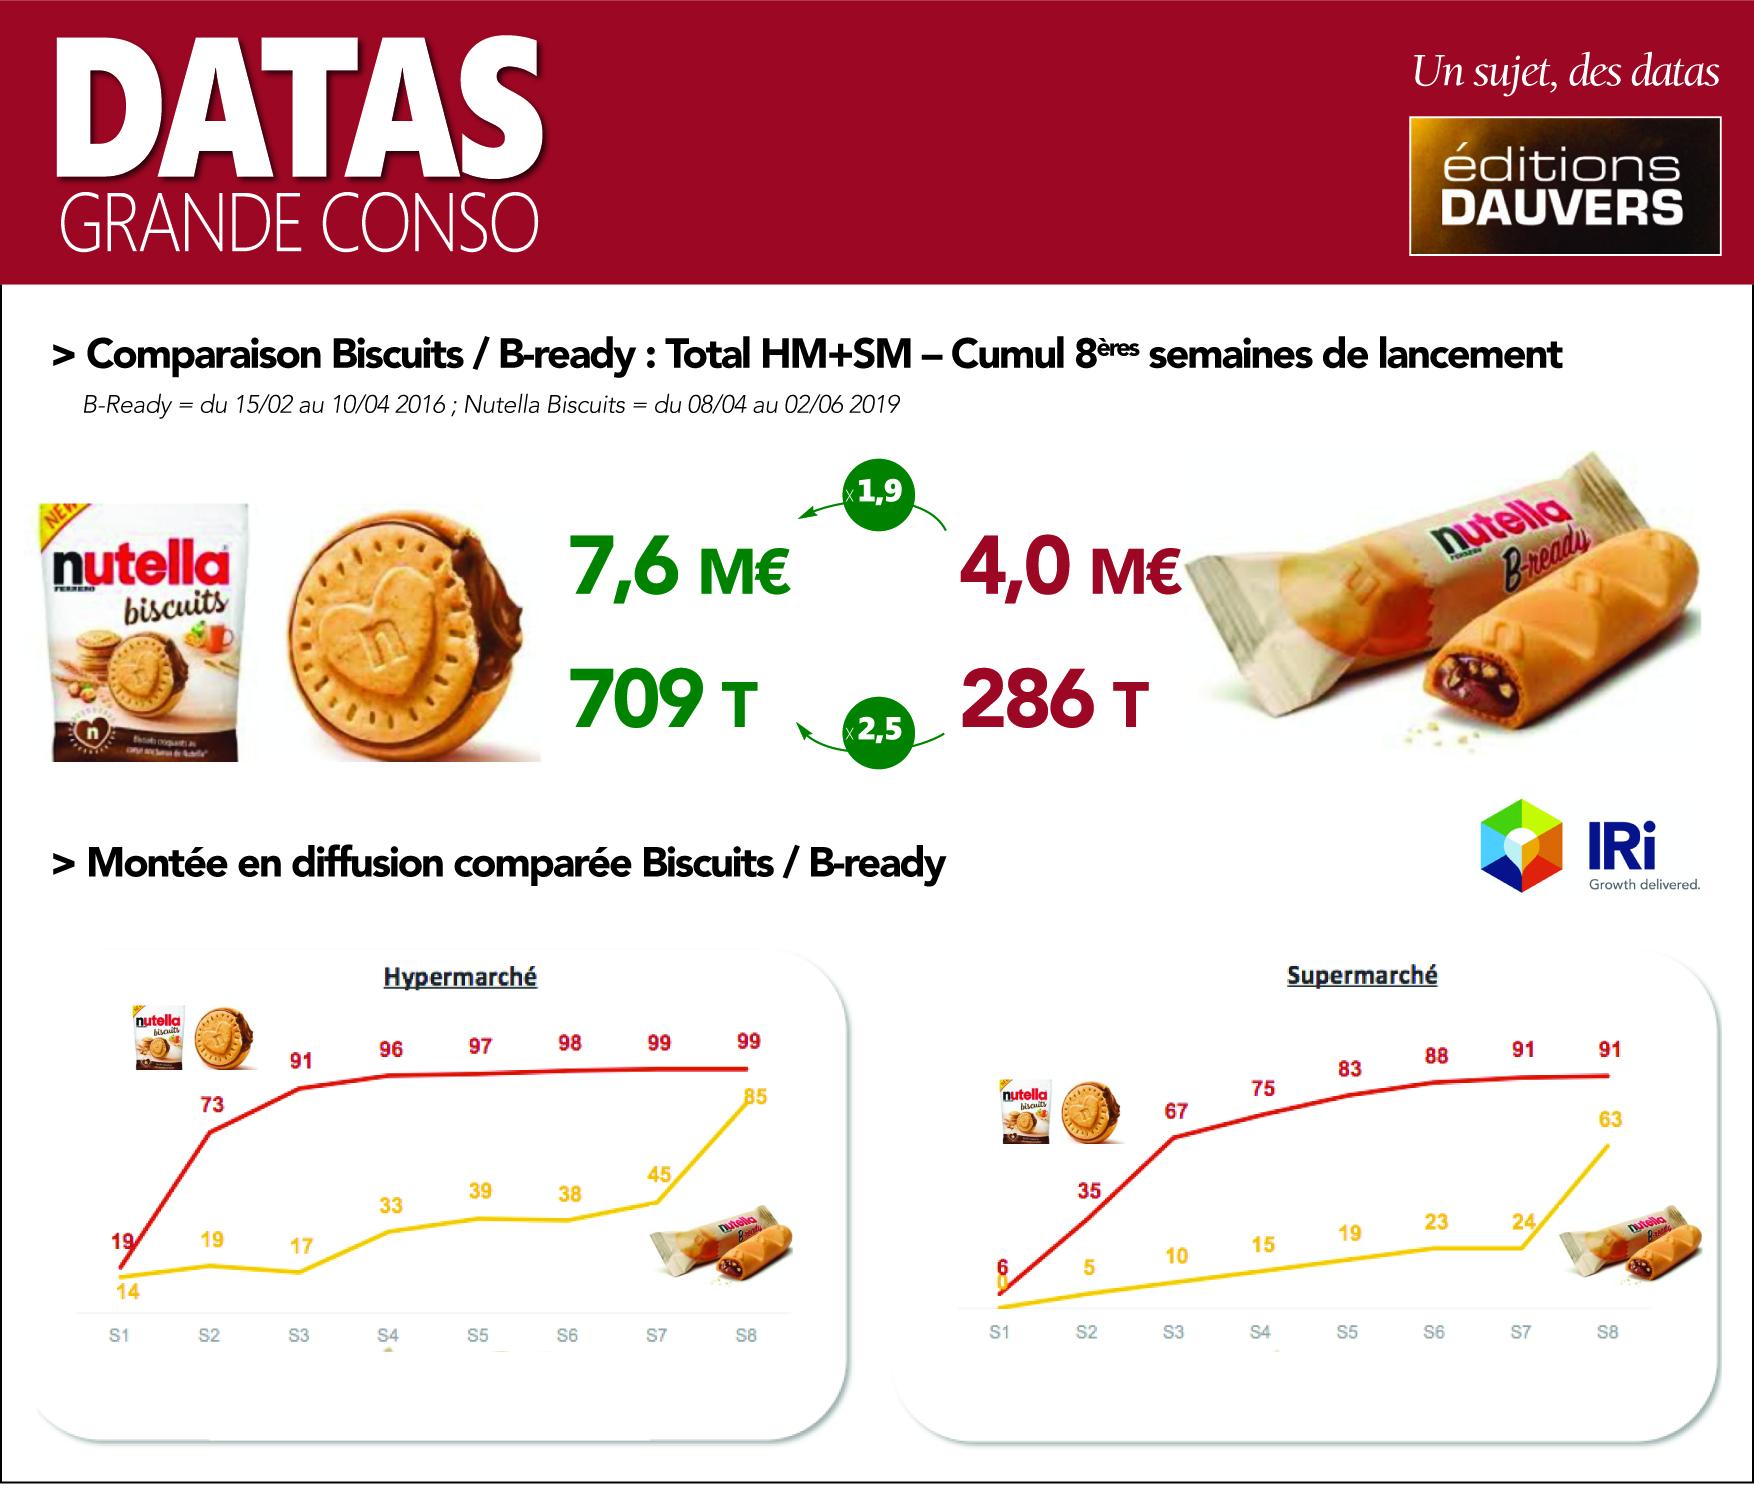 DATAS GRANDE CONSO Nutella B